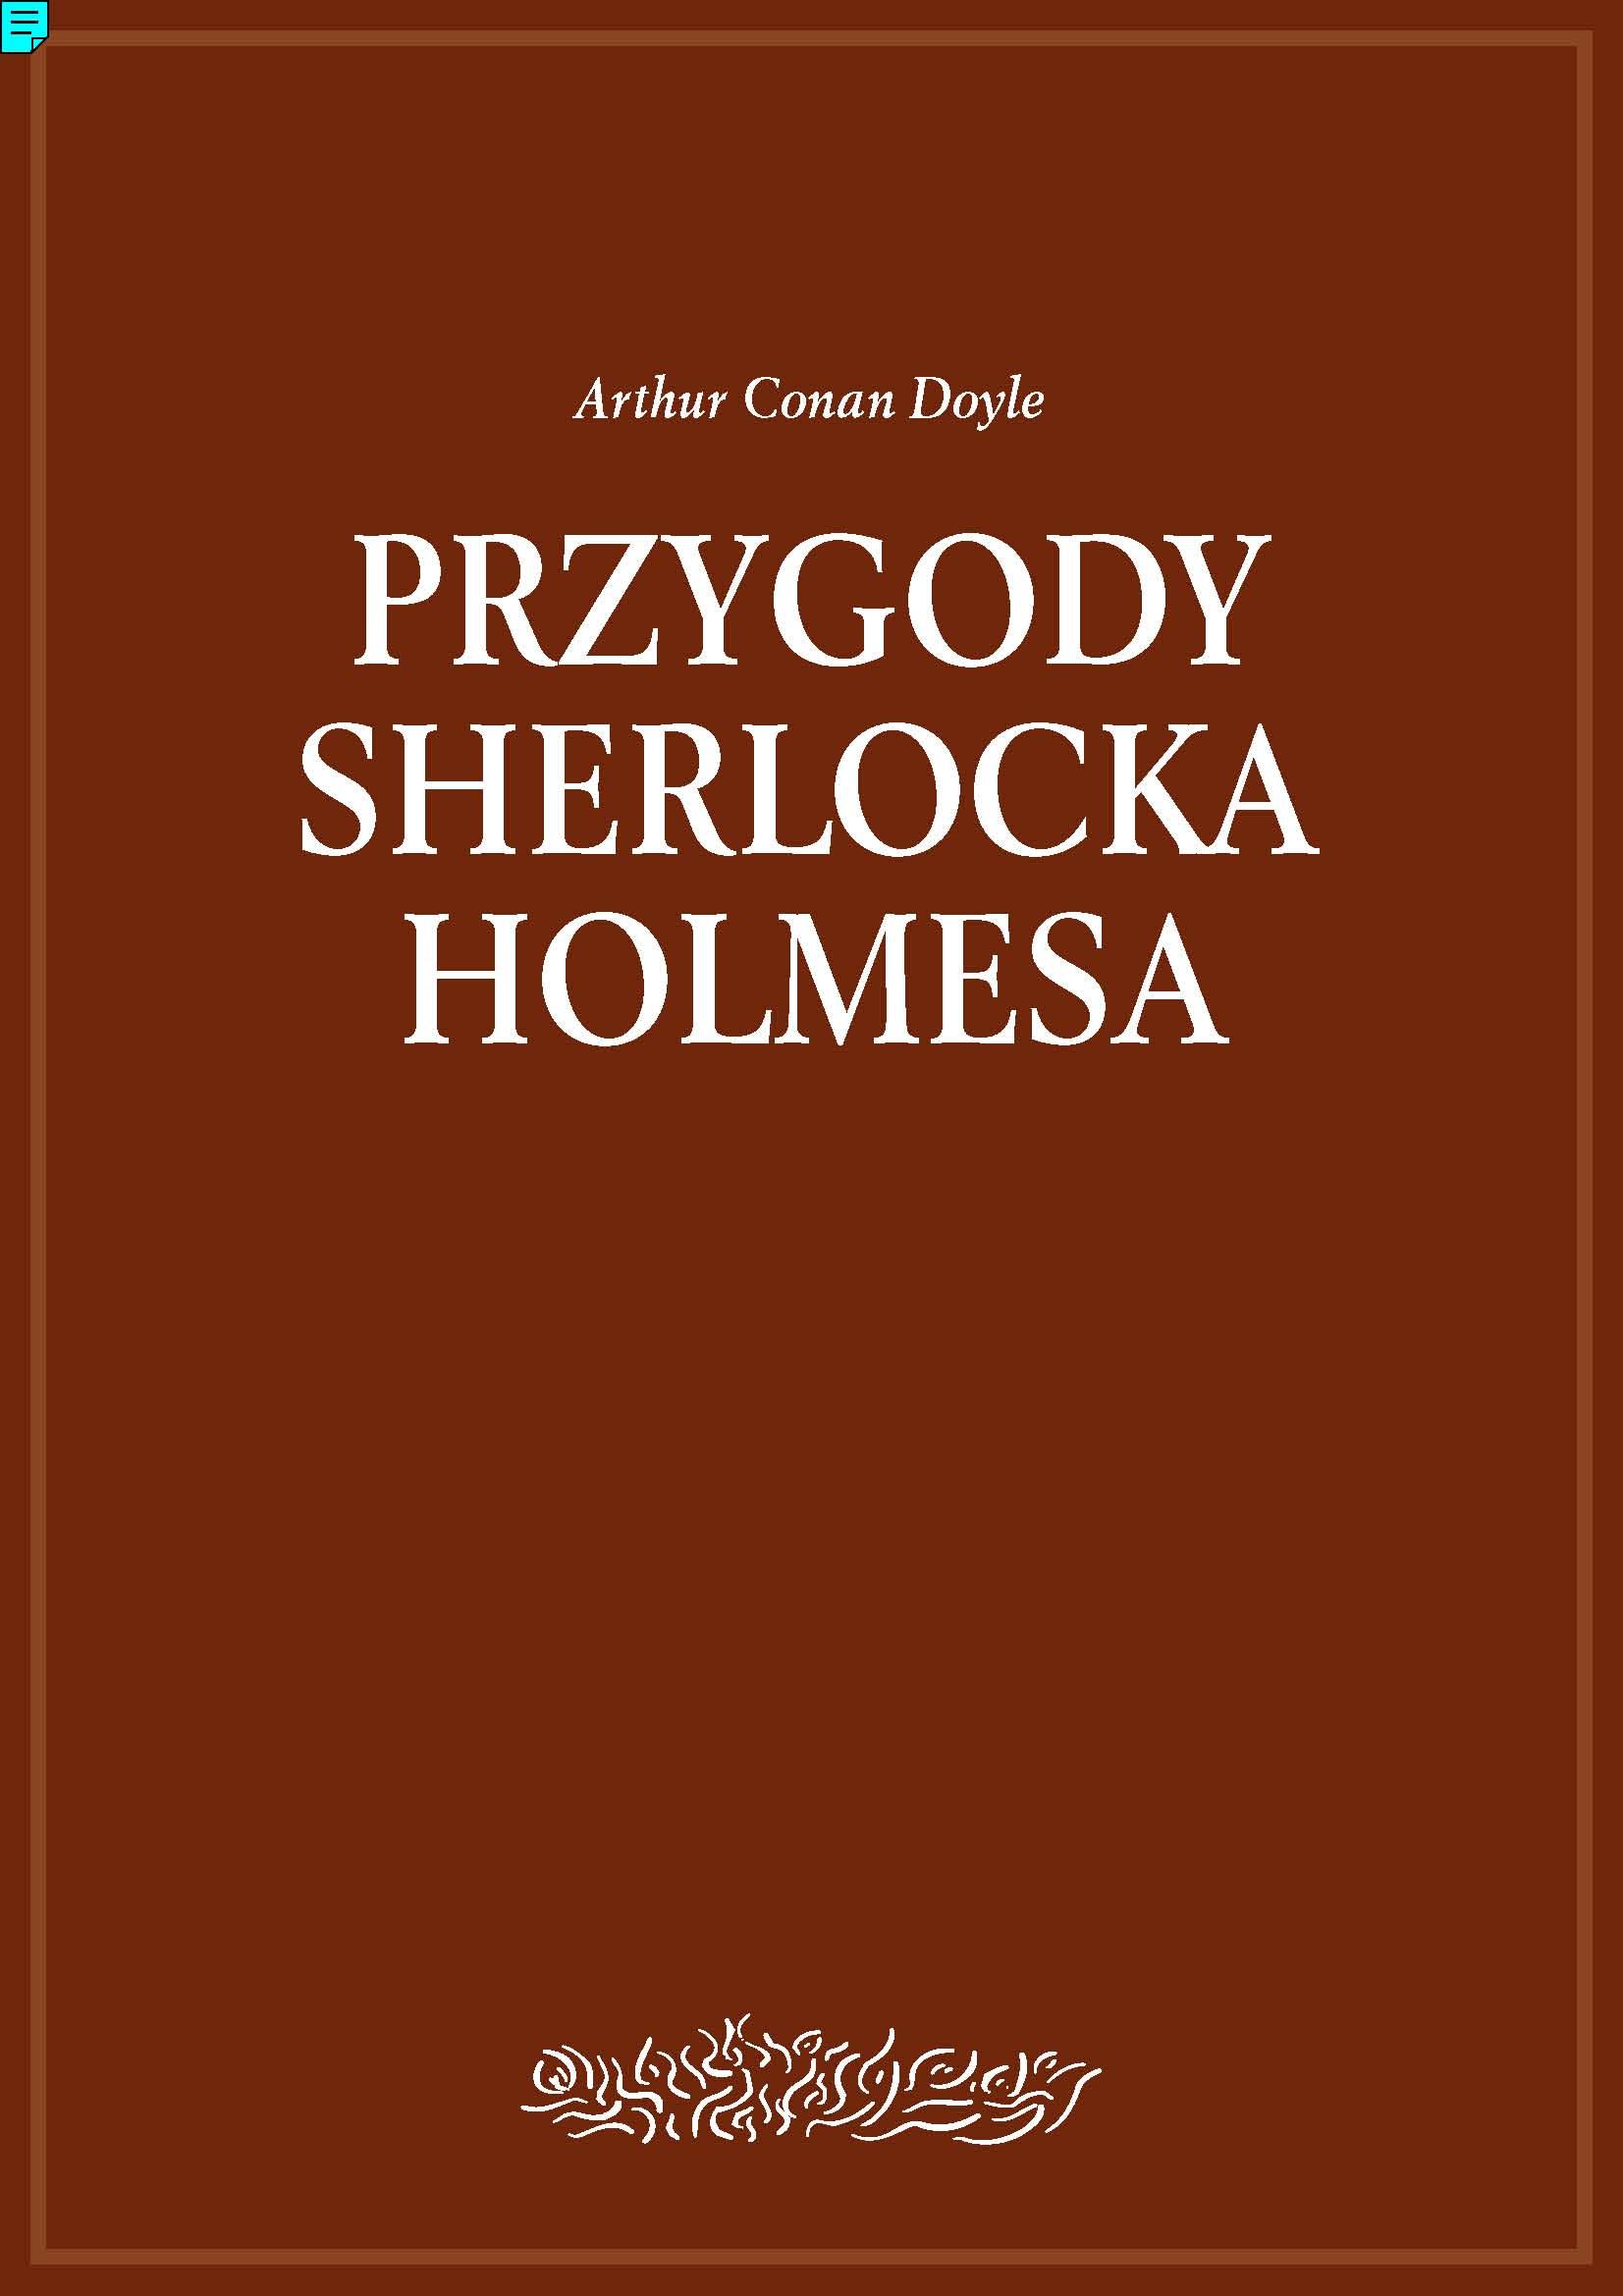 PRZYGODY SHERLOCKA HOLMESA • EBOOK • E-KSIĄŻKA